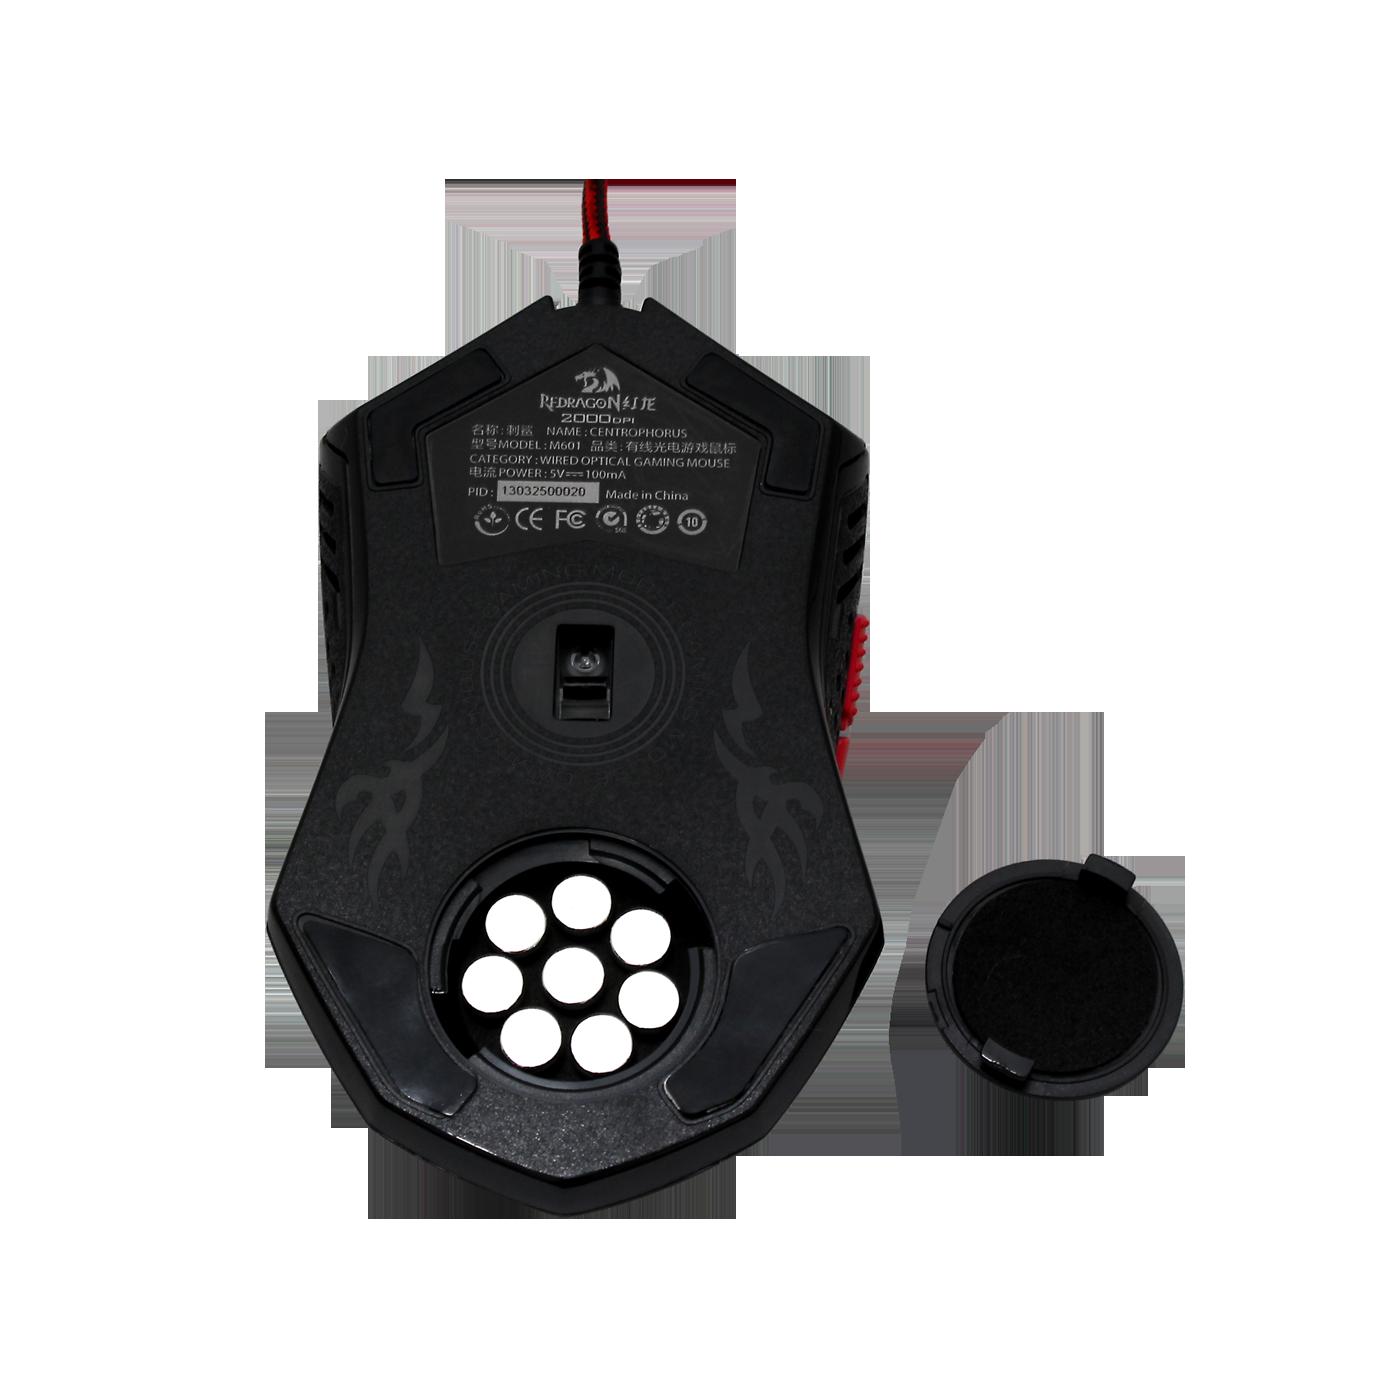 Redragon Centrophorus M601 Gaming Mouse Mega Electronics